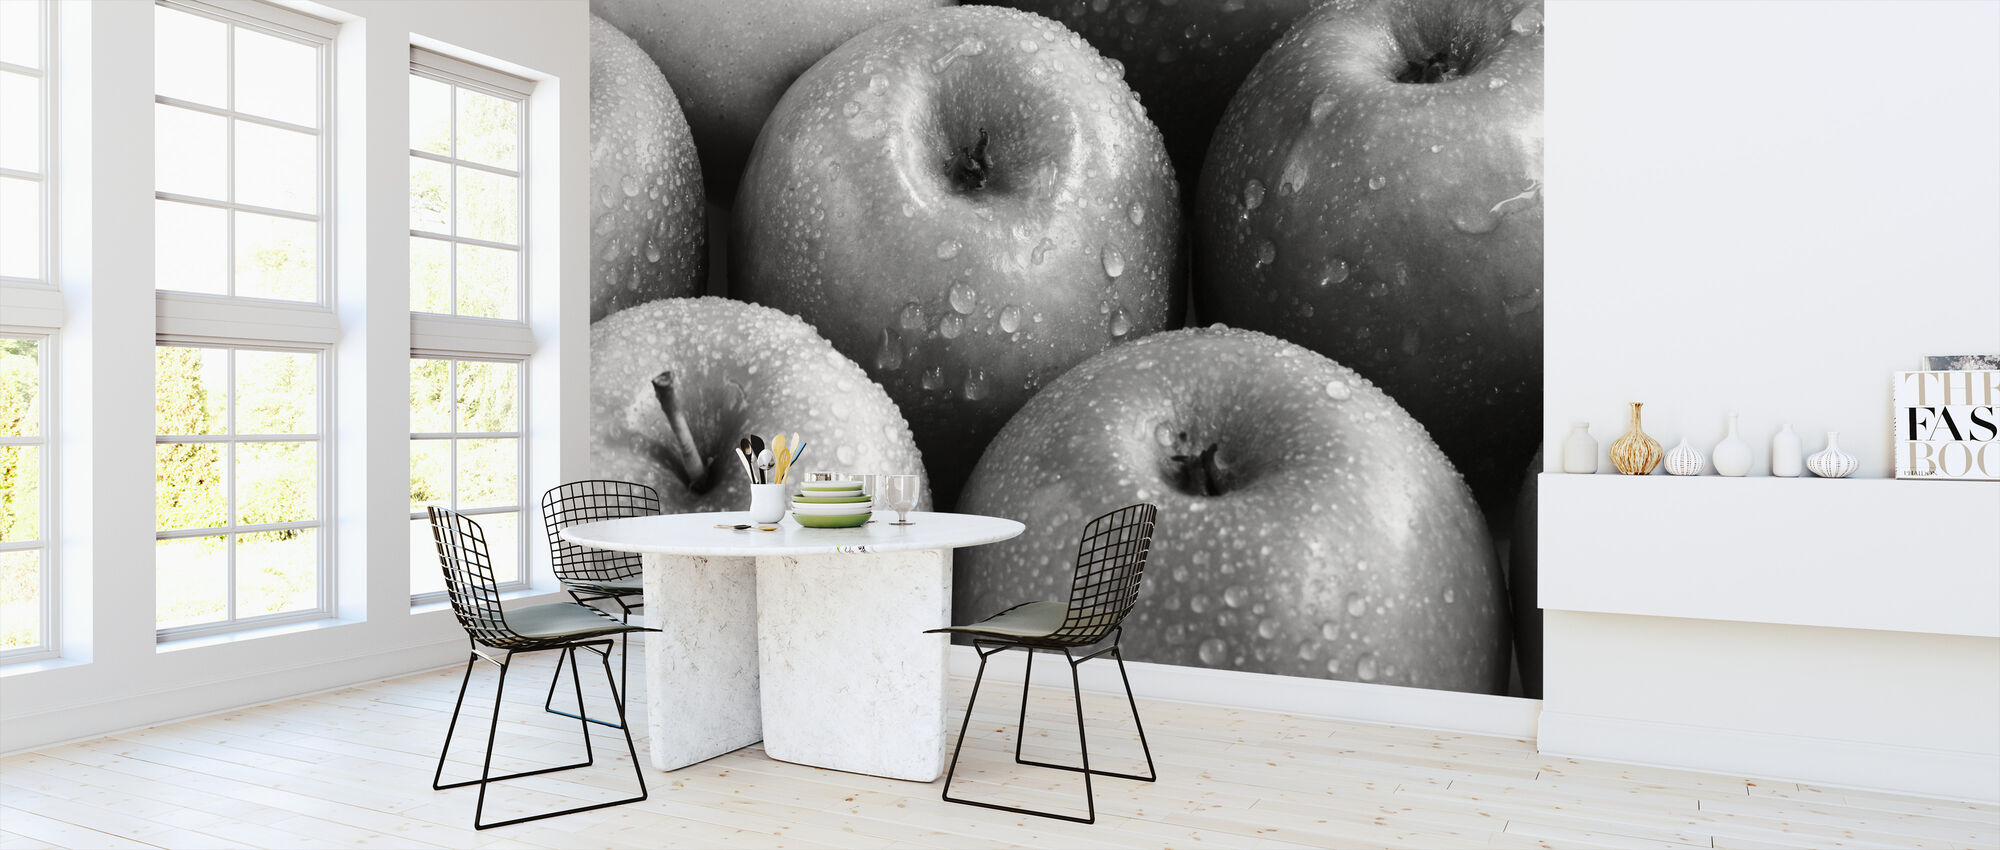 Apples - b/w - Wallpaper - Kitchen